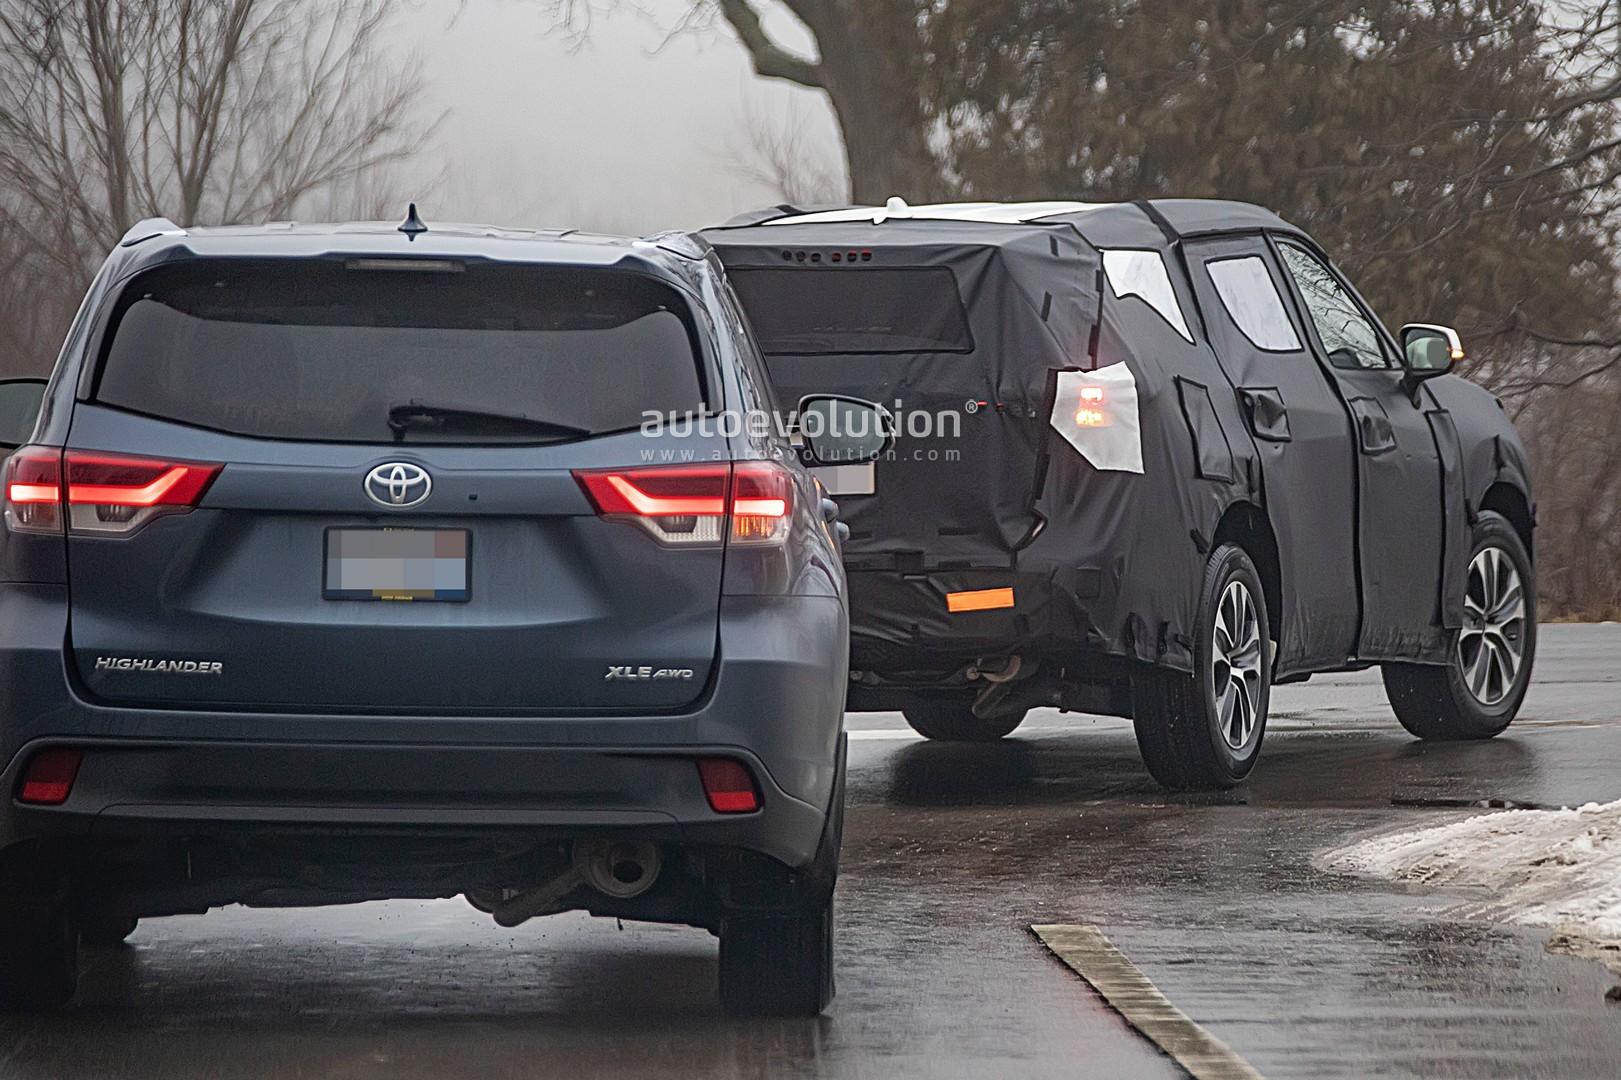 2020 Toyota Highlander Spyshots Reveal More of the RAV4 ...